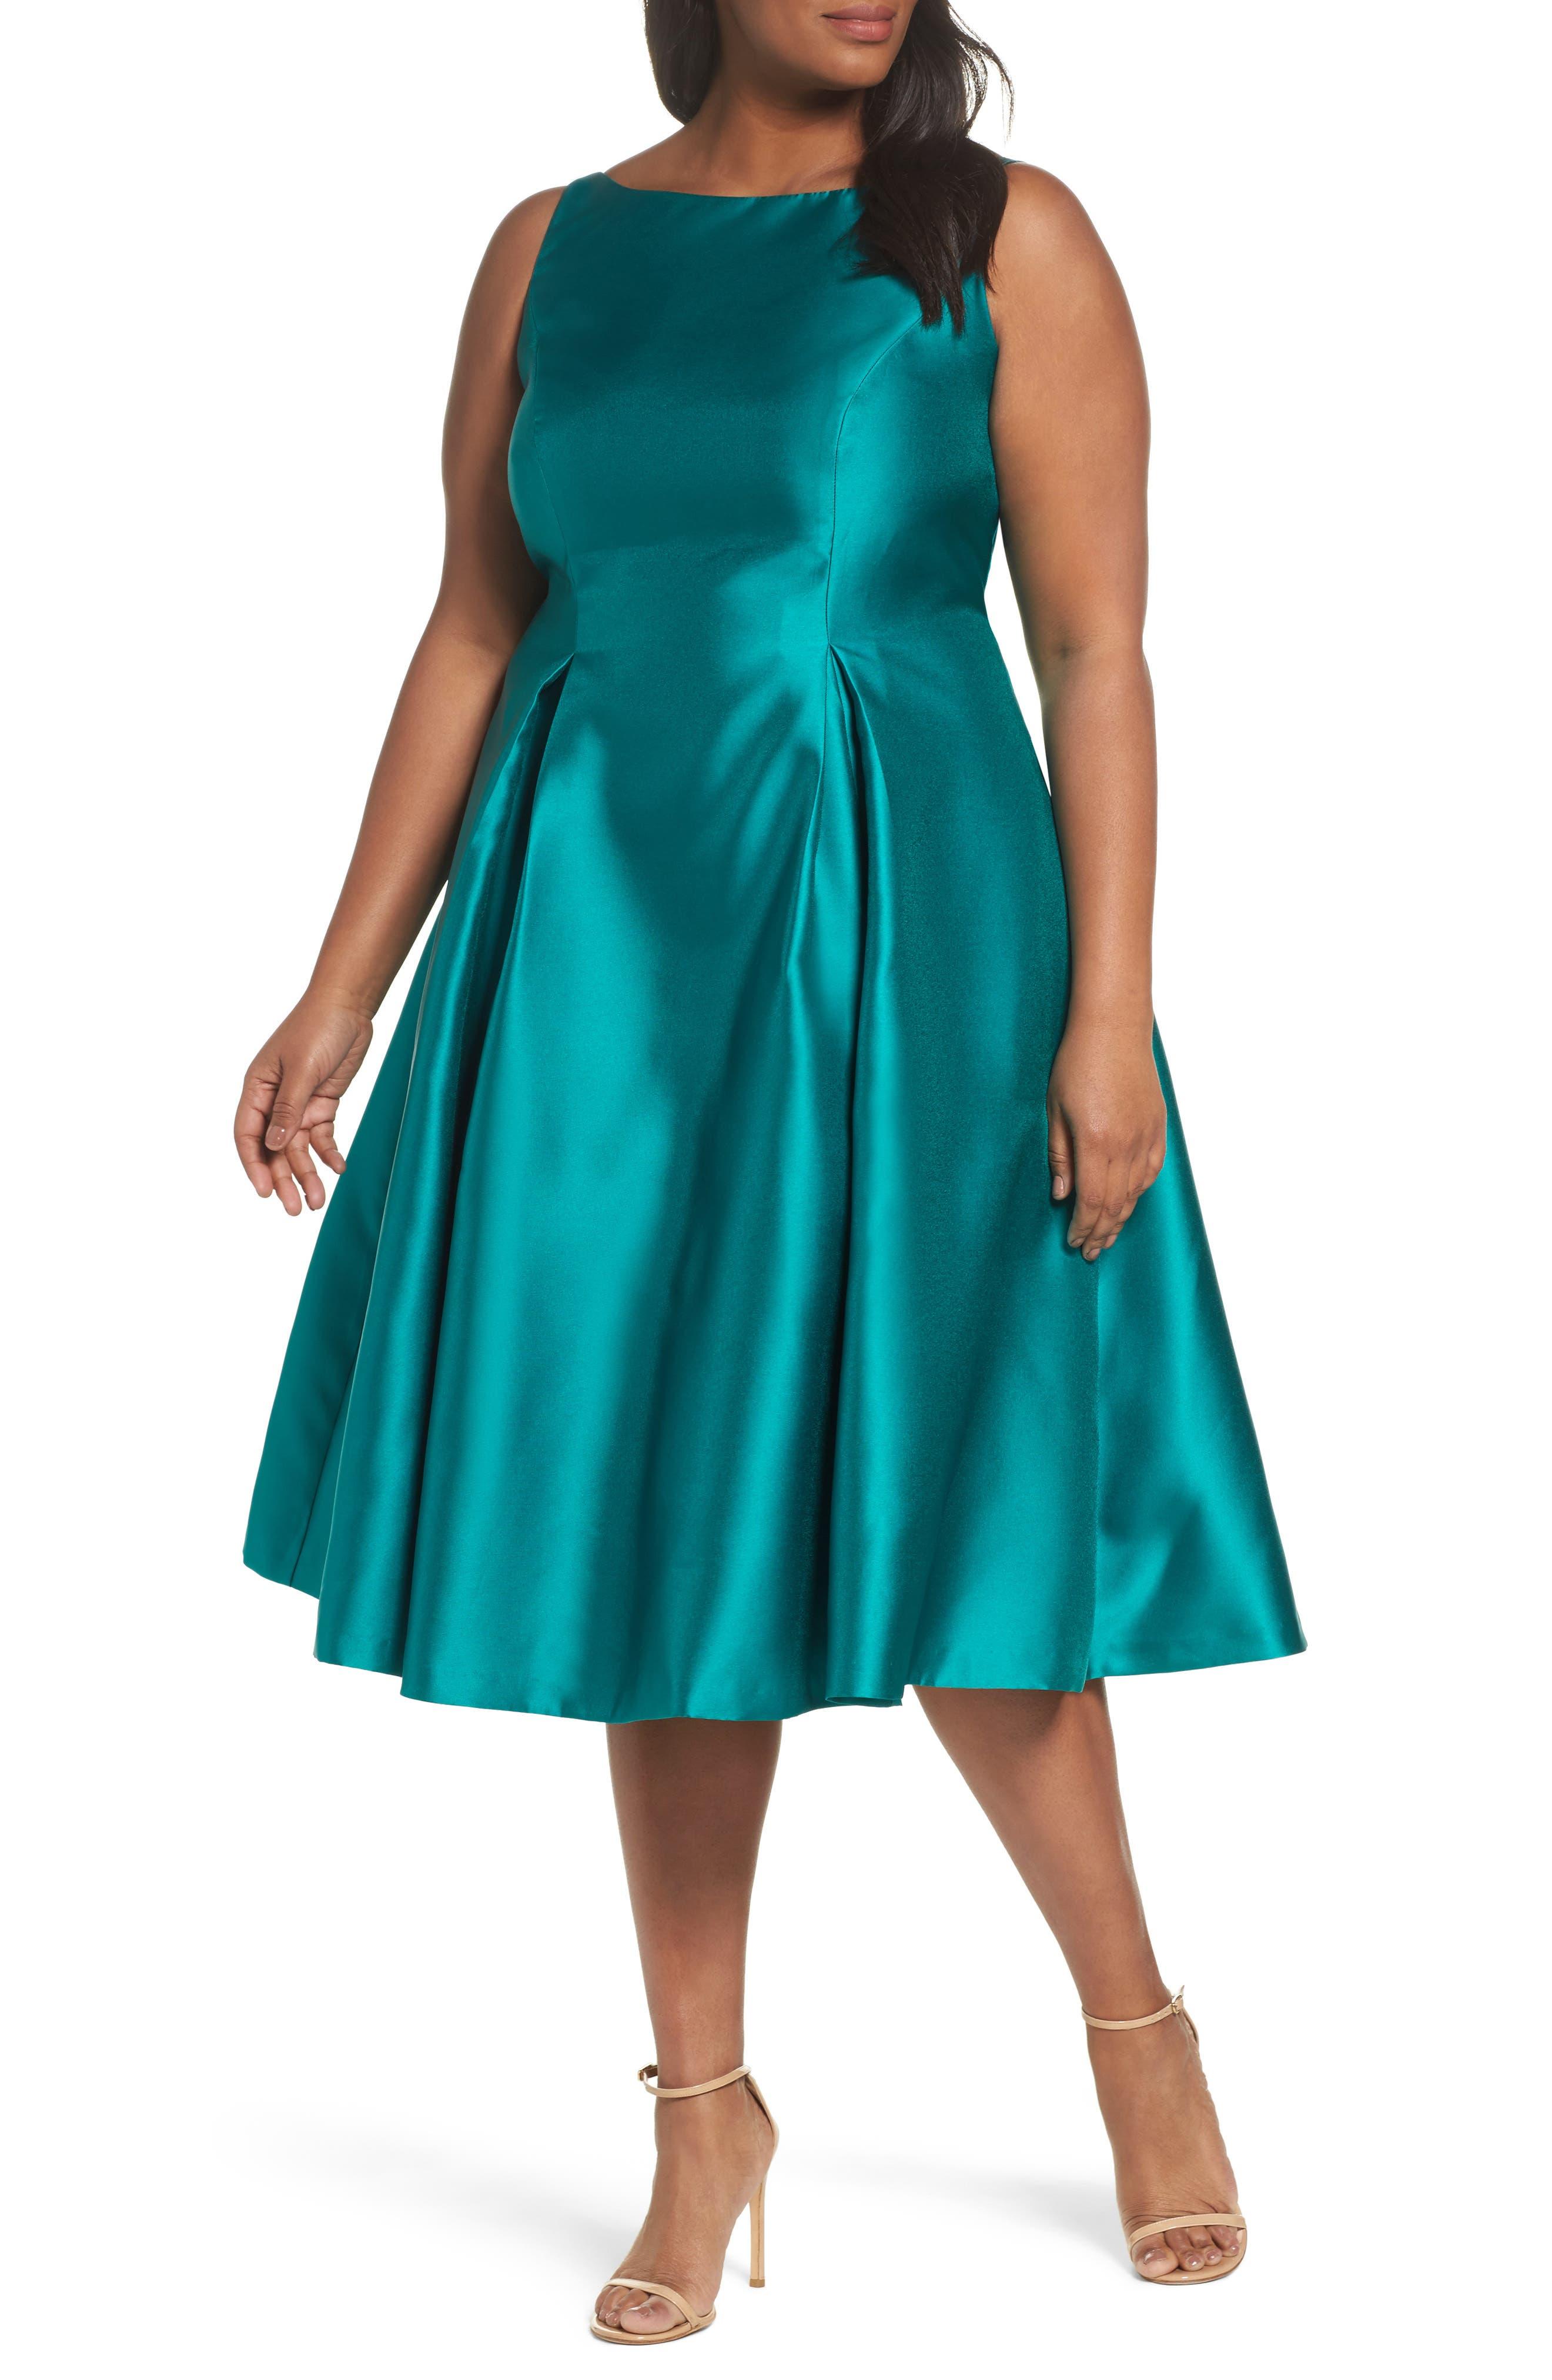 Main Image - Adrianna Papell Sleeveless Mikado Fit & Flare Midi Dress (Plus Size)